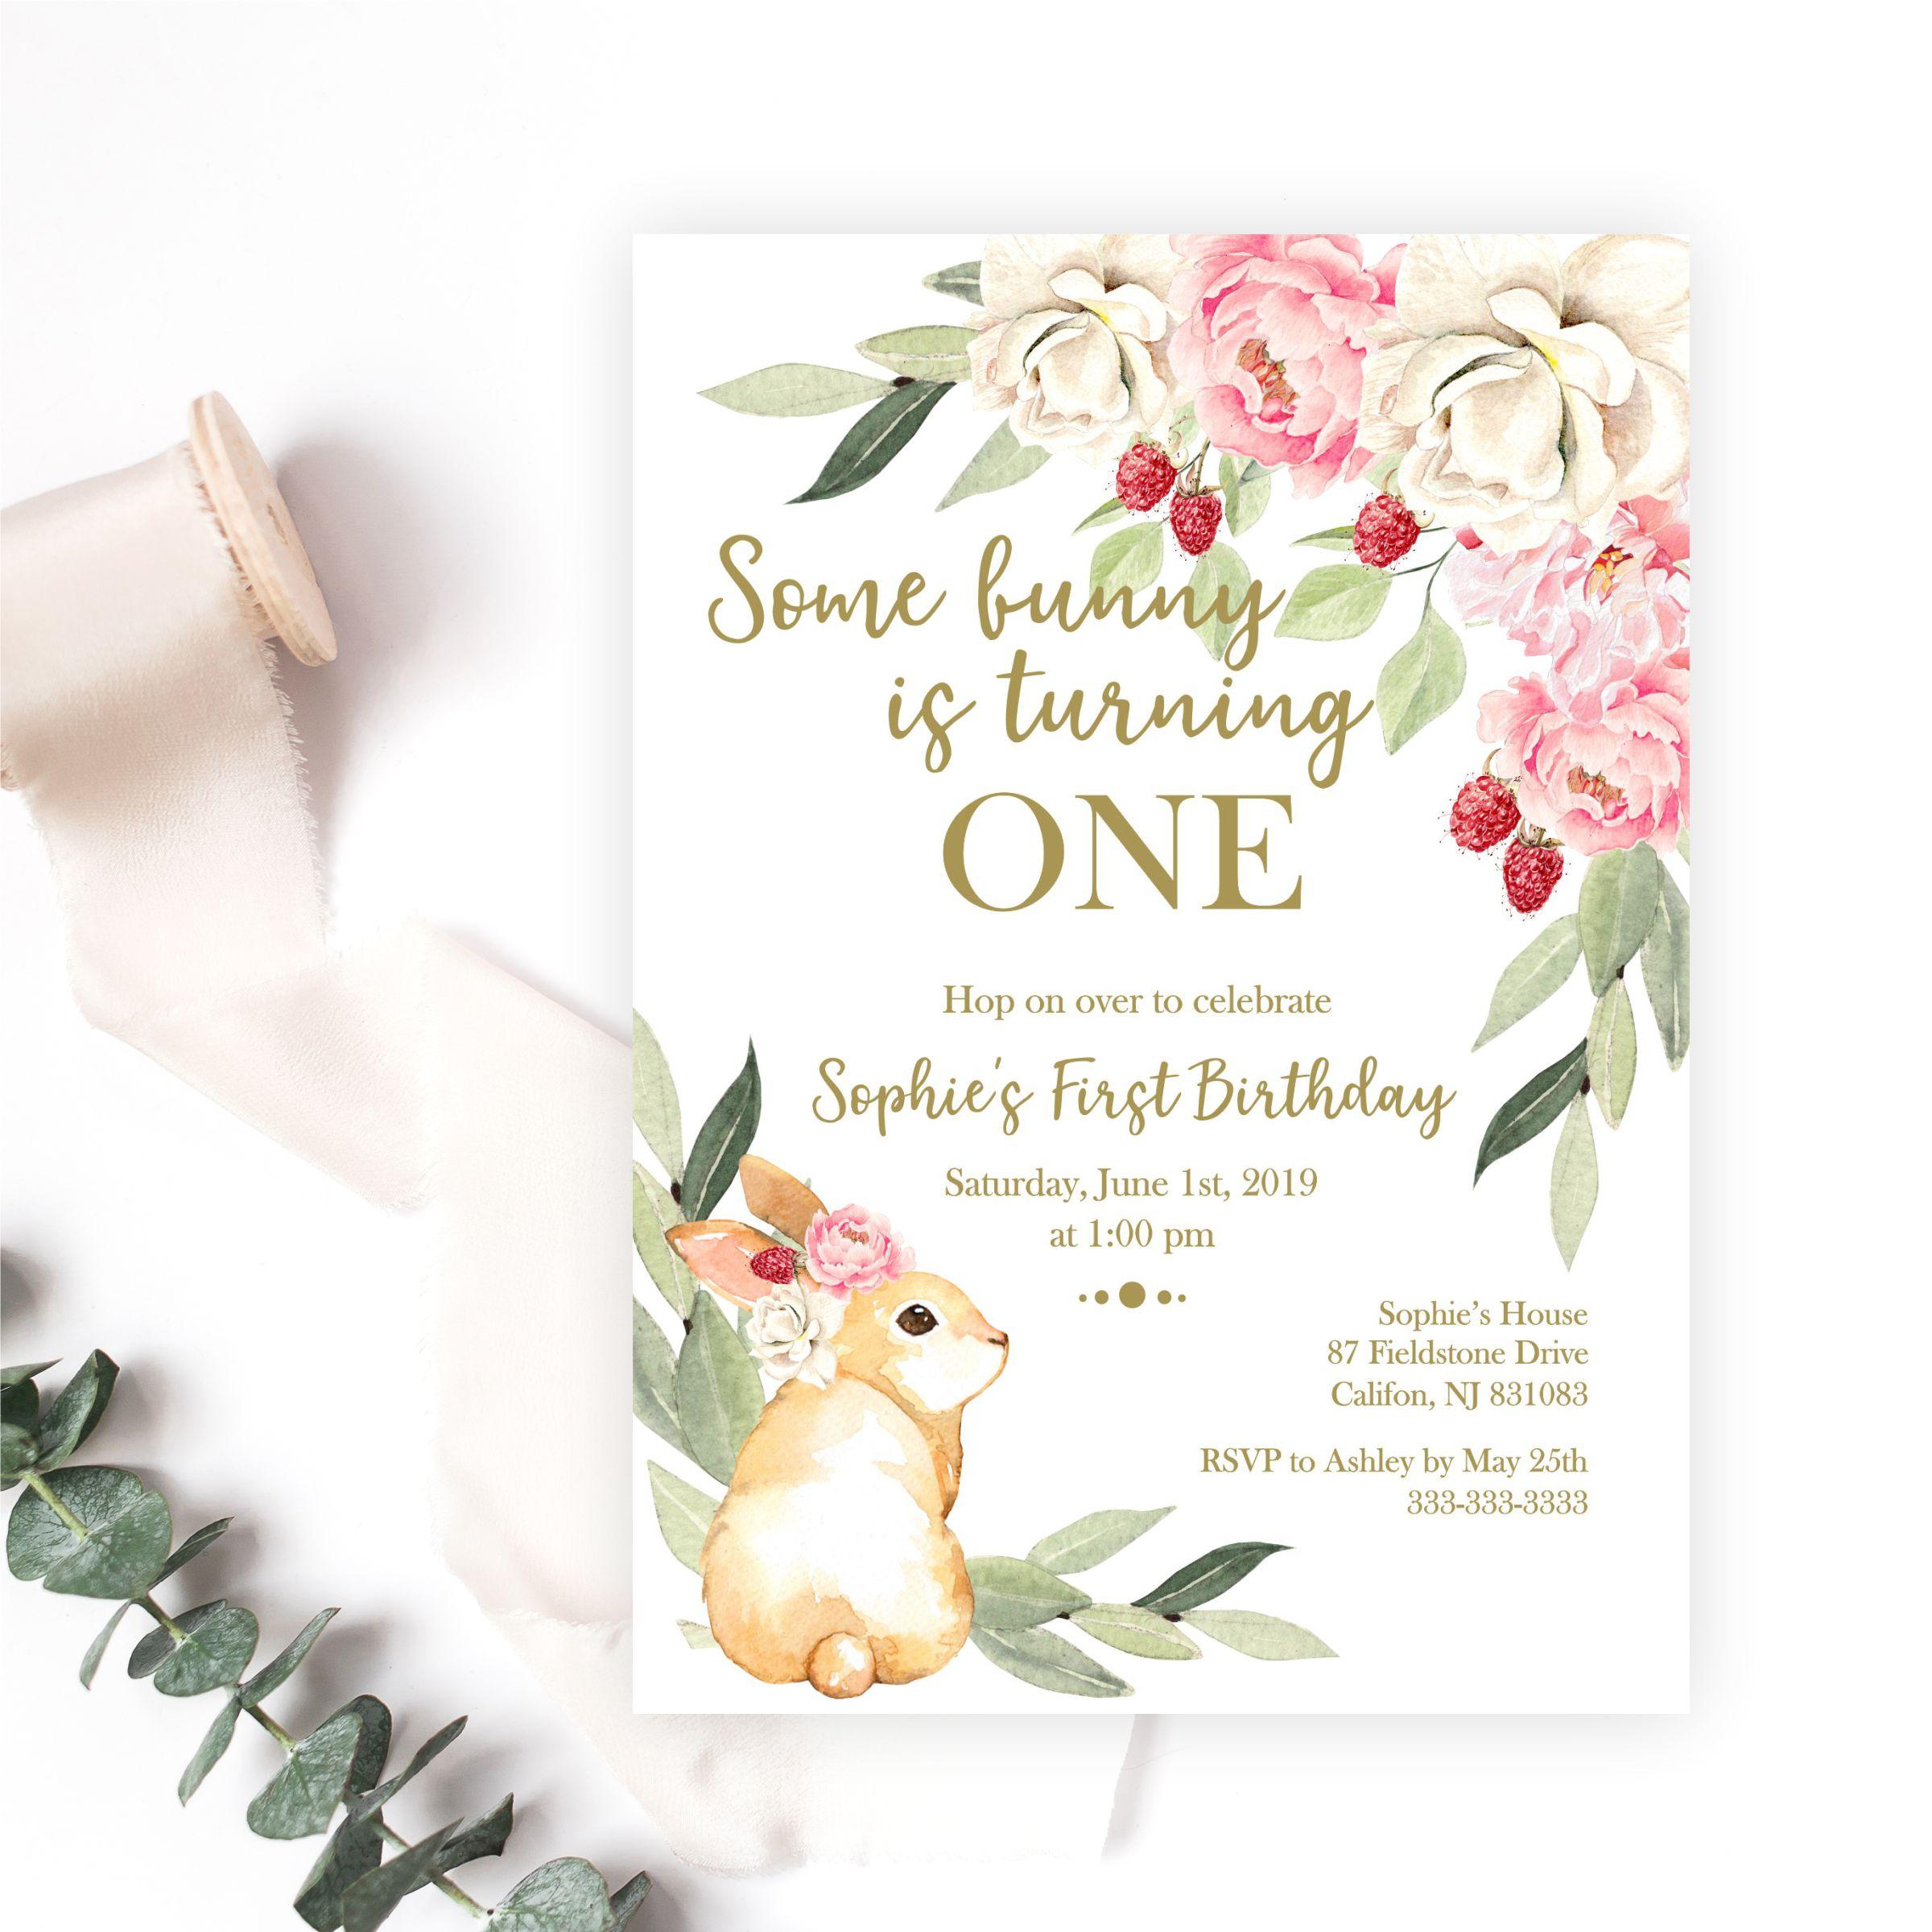 some bunny is turning one birthday invitation magnolia street papersome bunny is turning one birthday invitation